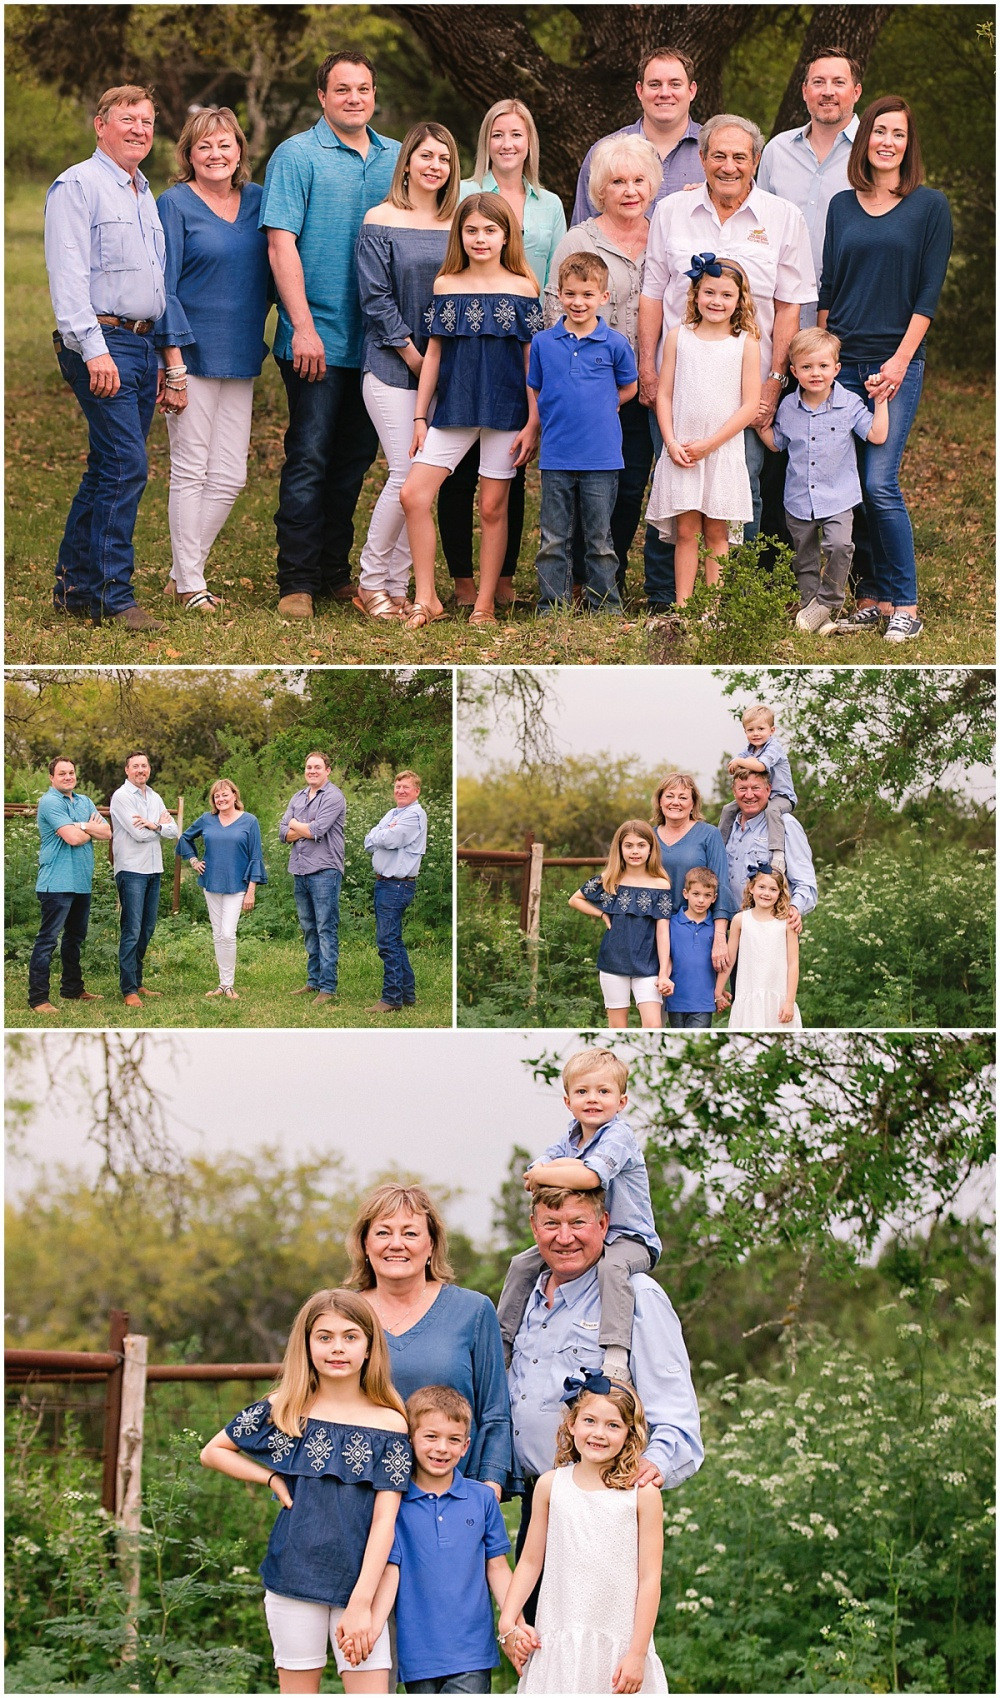 Family-Portraits-Classen-New-Braunels-Ranch-Carly-Barton-Photography_0045.jpg